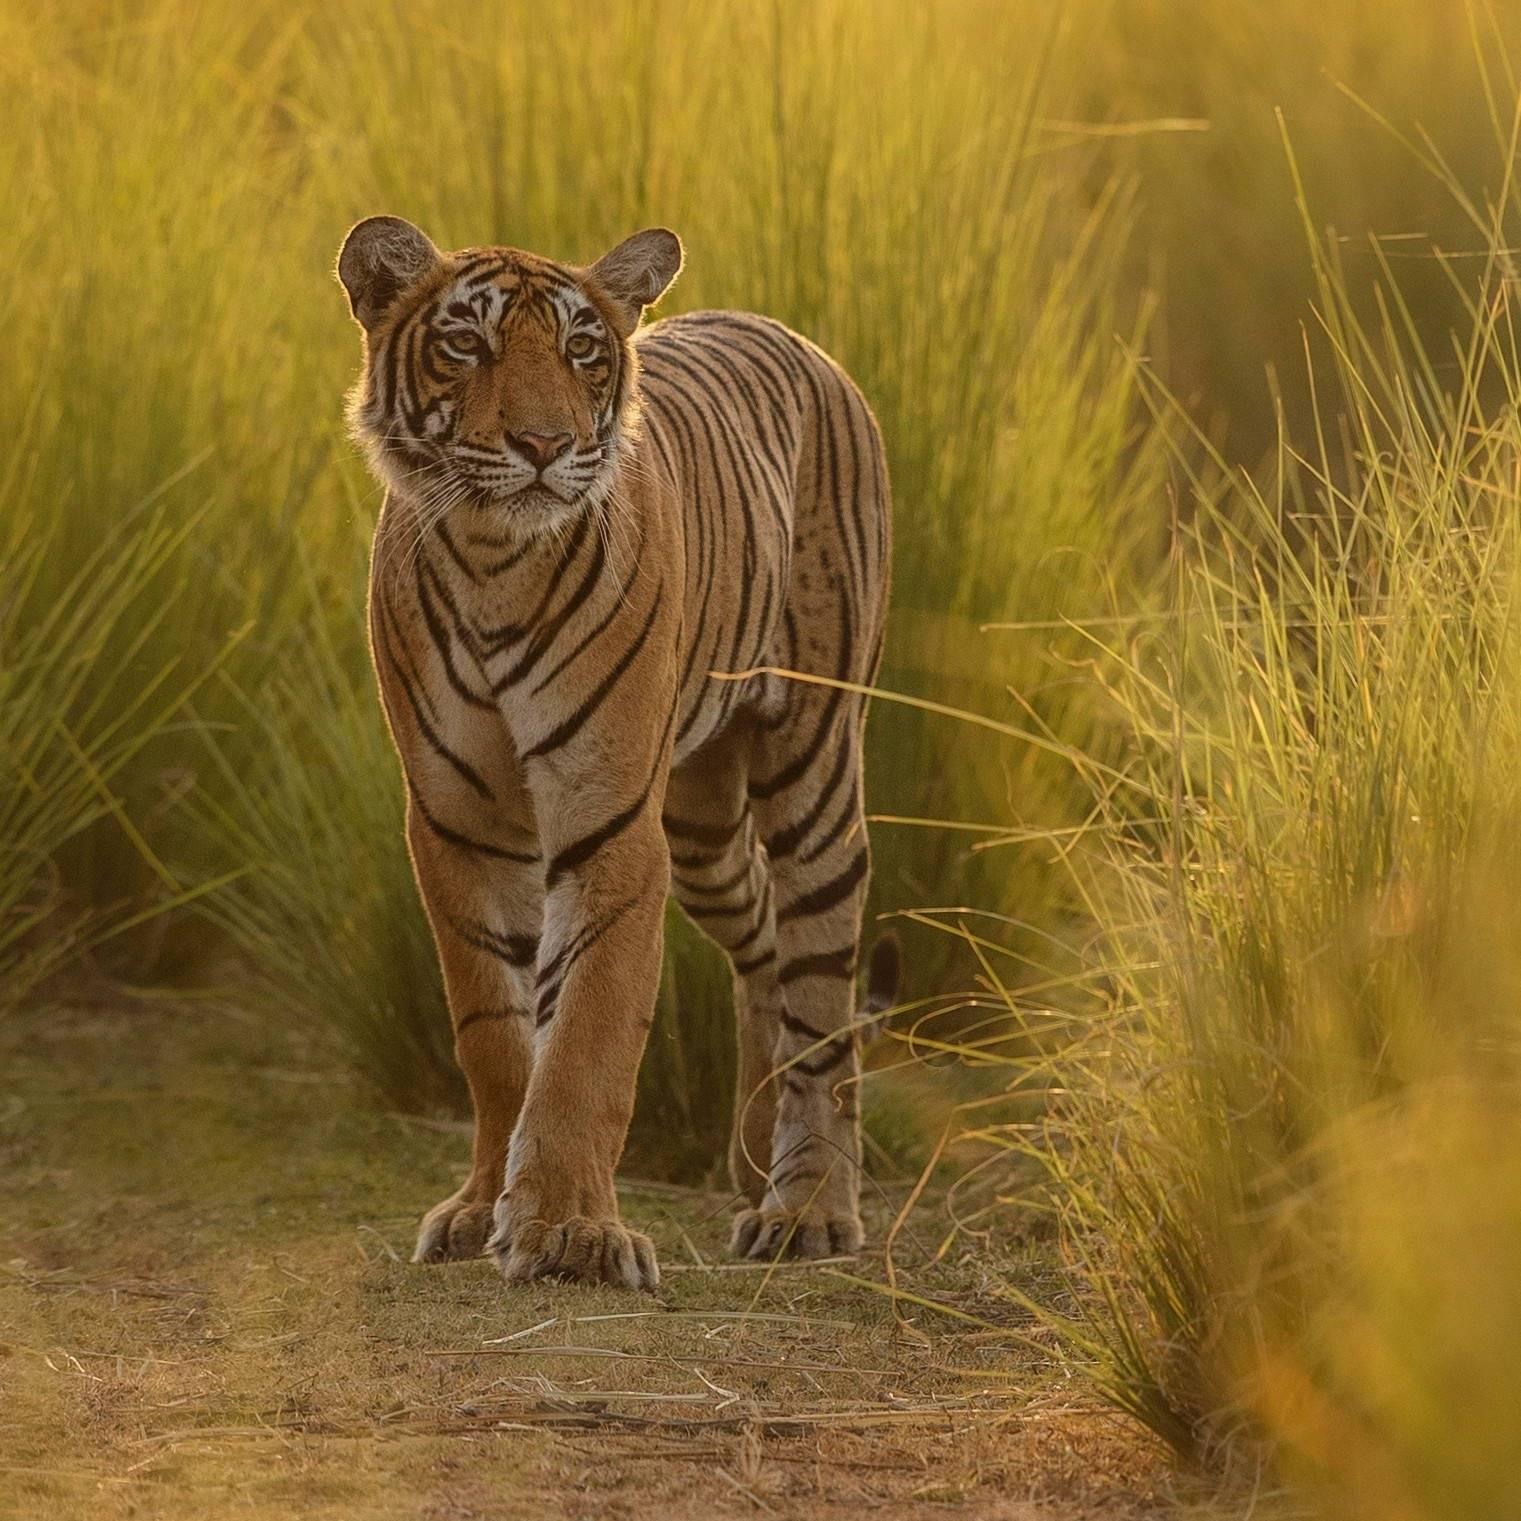 wildlife tiger grass